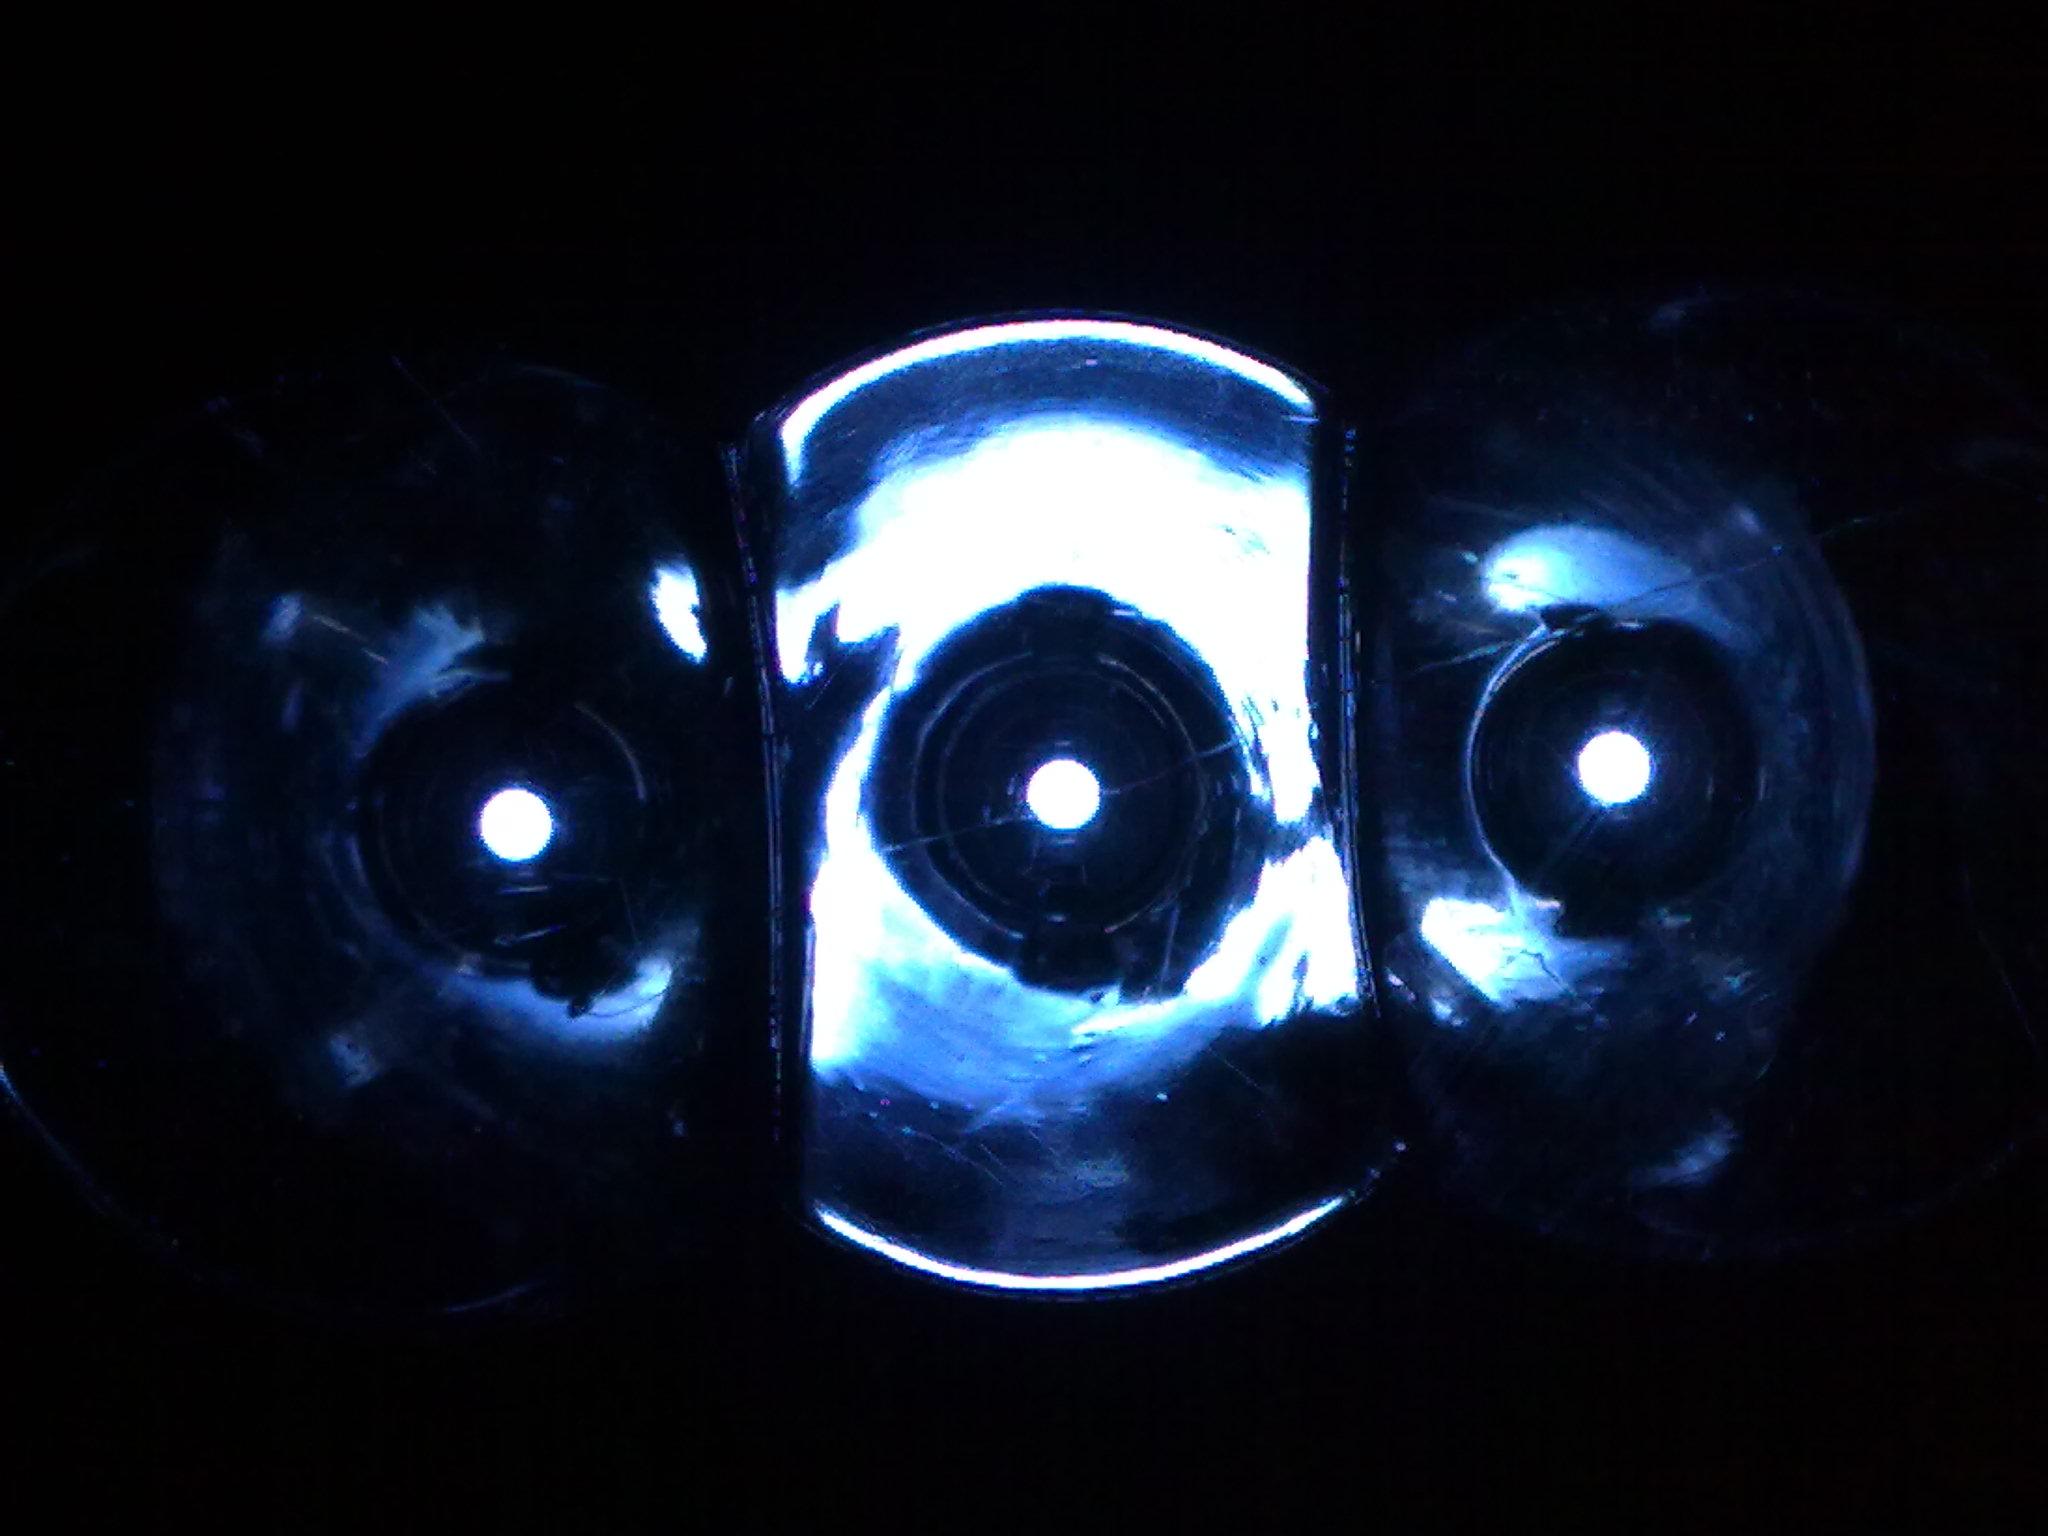 Three bubbles of light photo